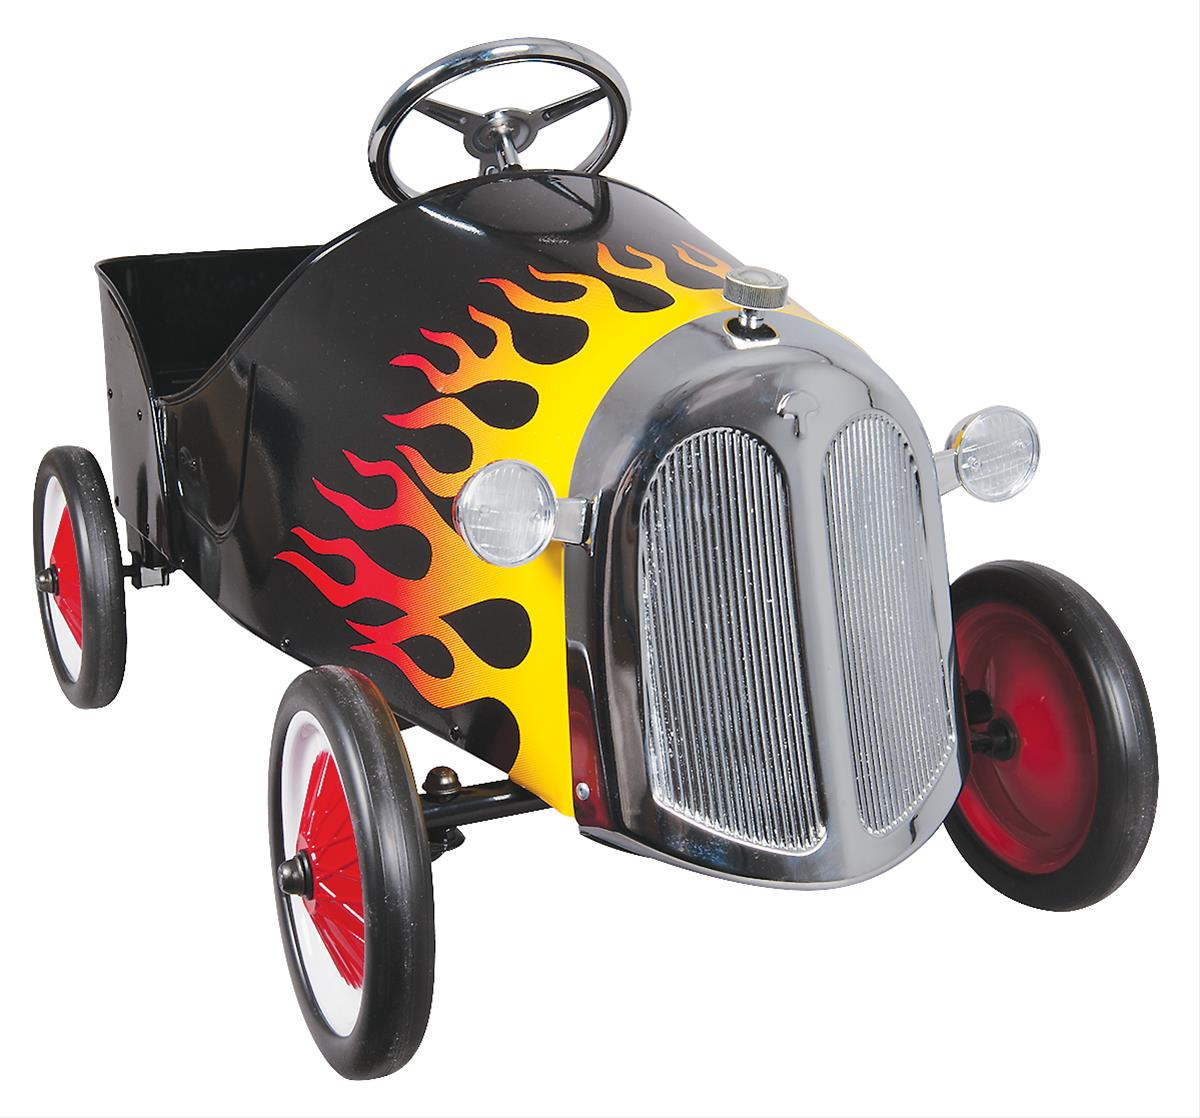 Black Flamed Hot Rod Pedal Car 9705